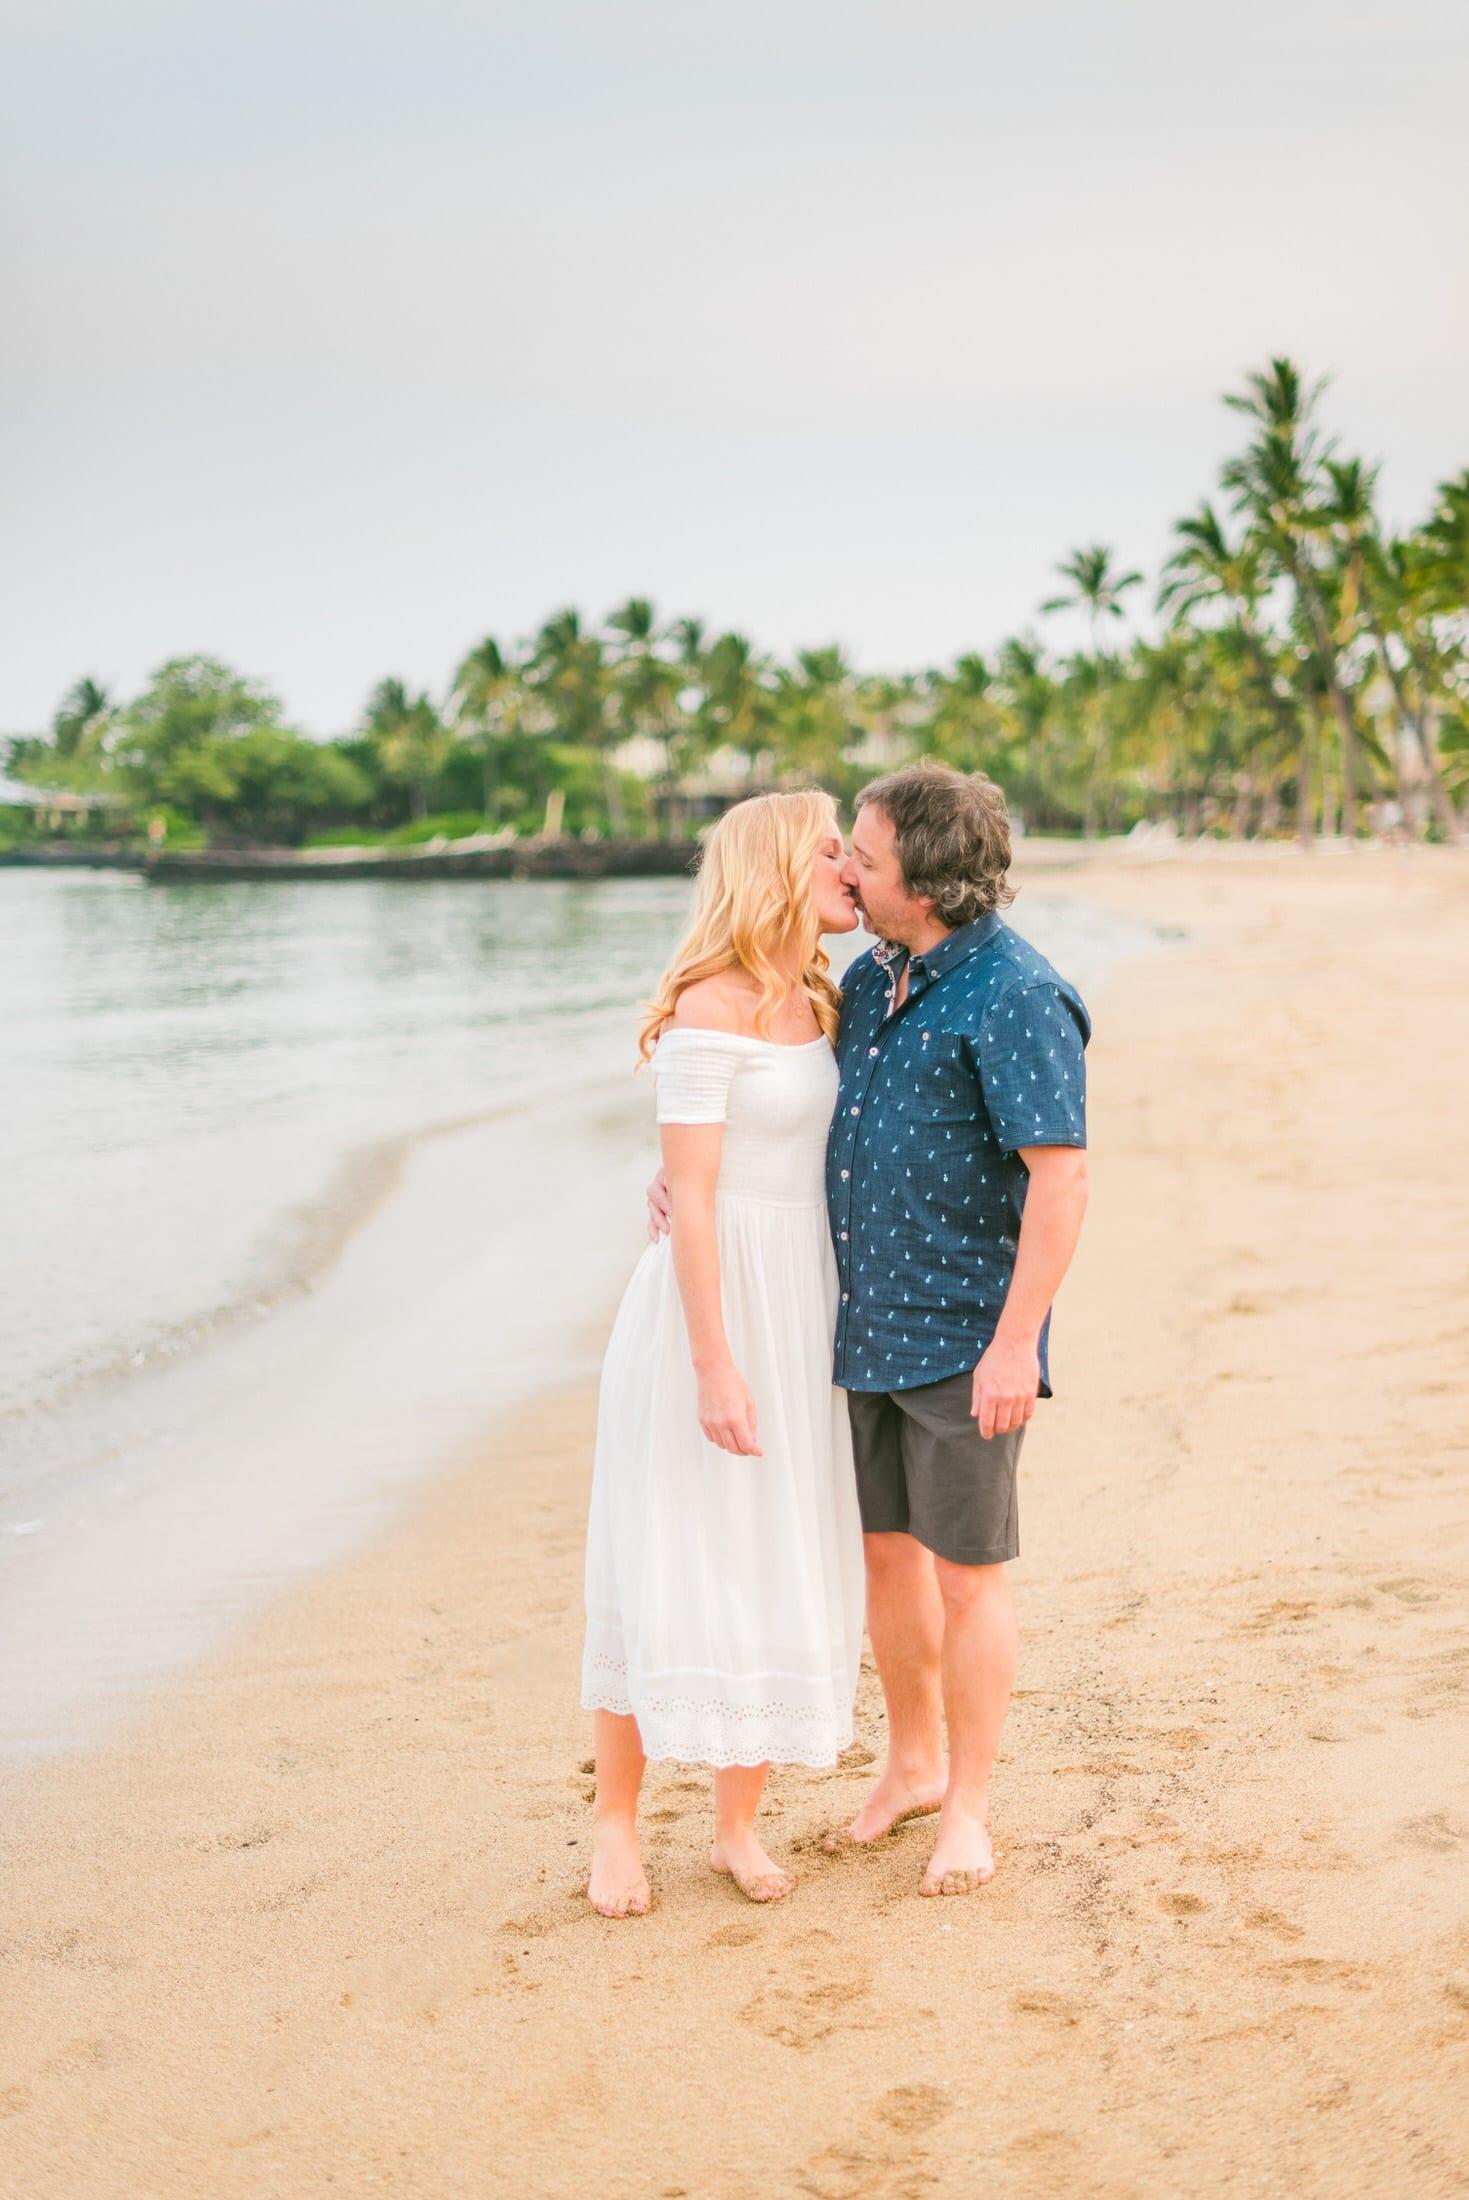 Waikoloa-Beach-Family-Photographer-Hawaii-56-1.jpg